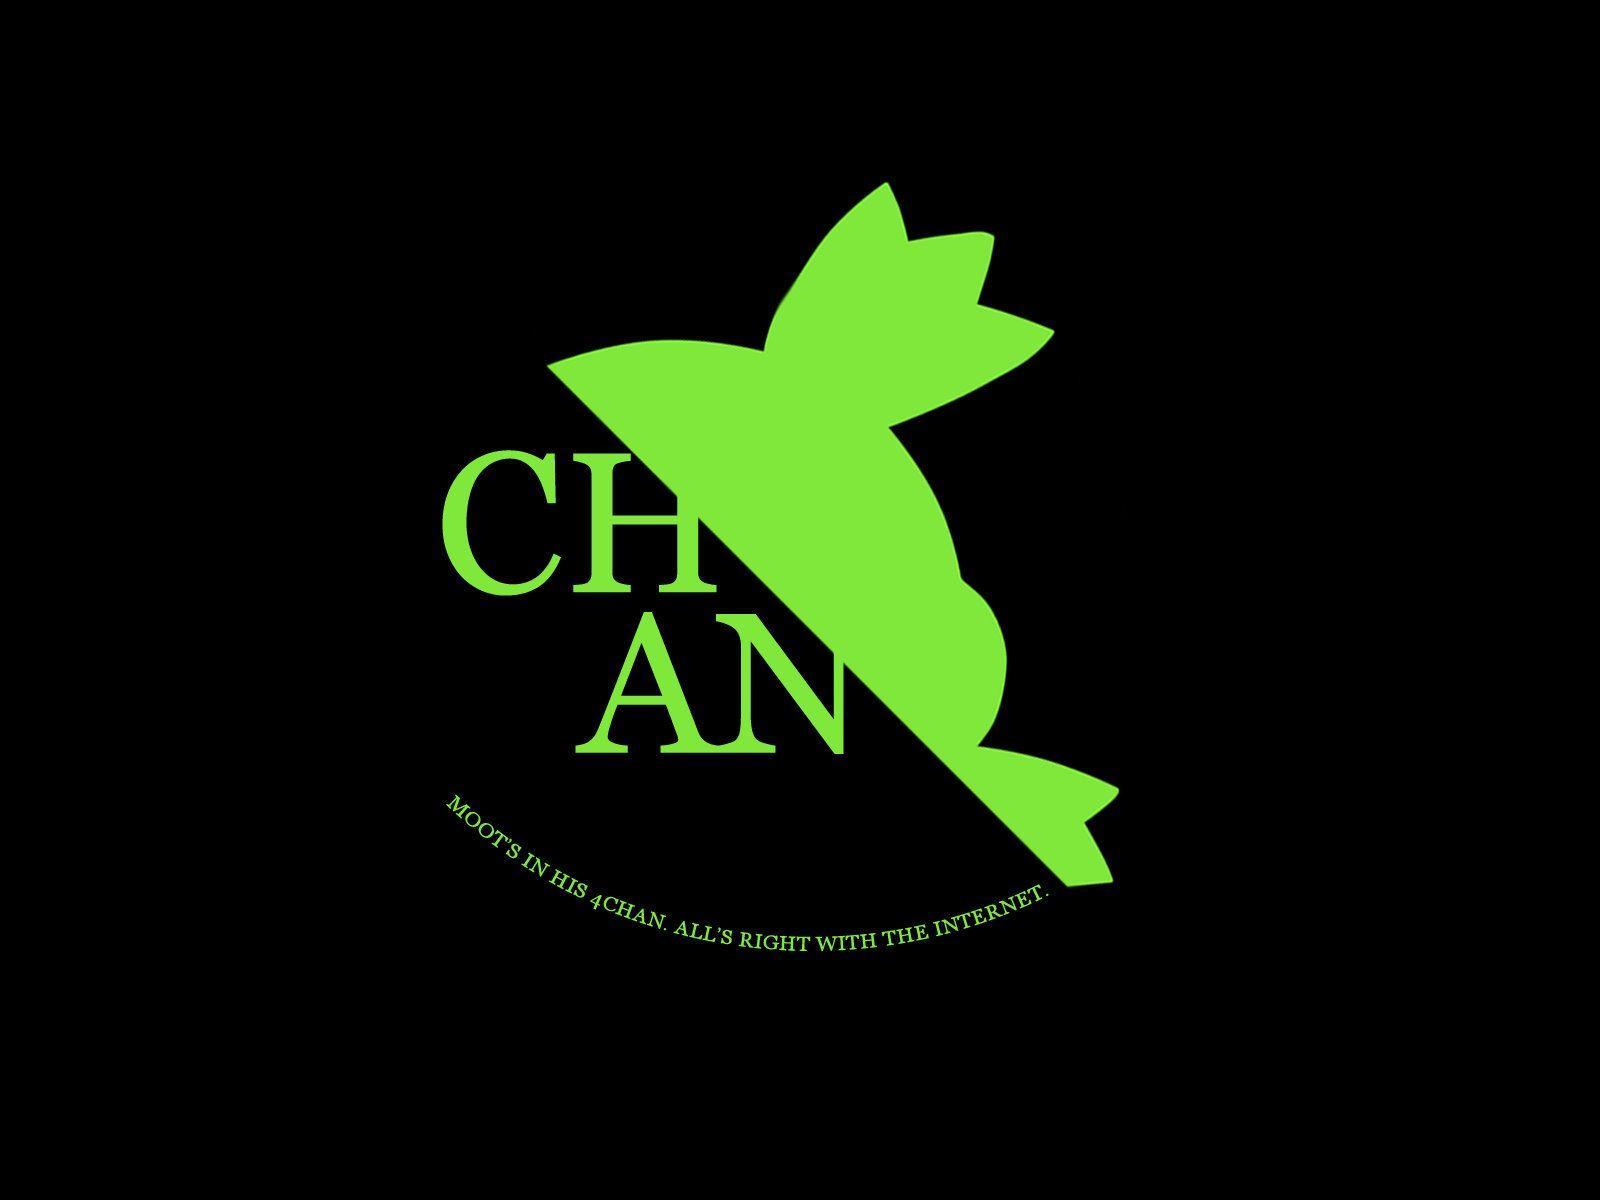 8chan Wallpaper: 4chan Backgrounds